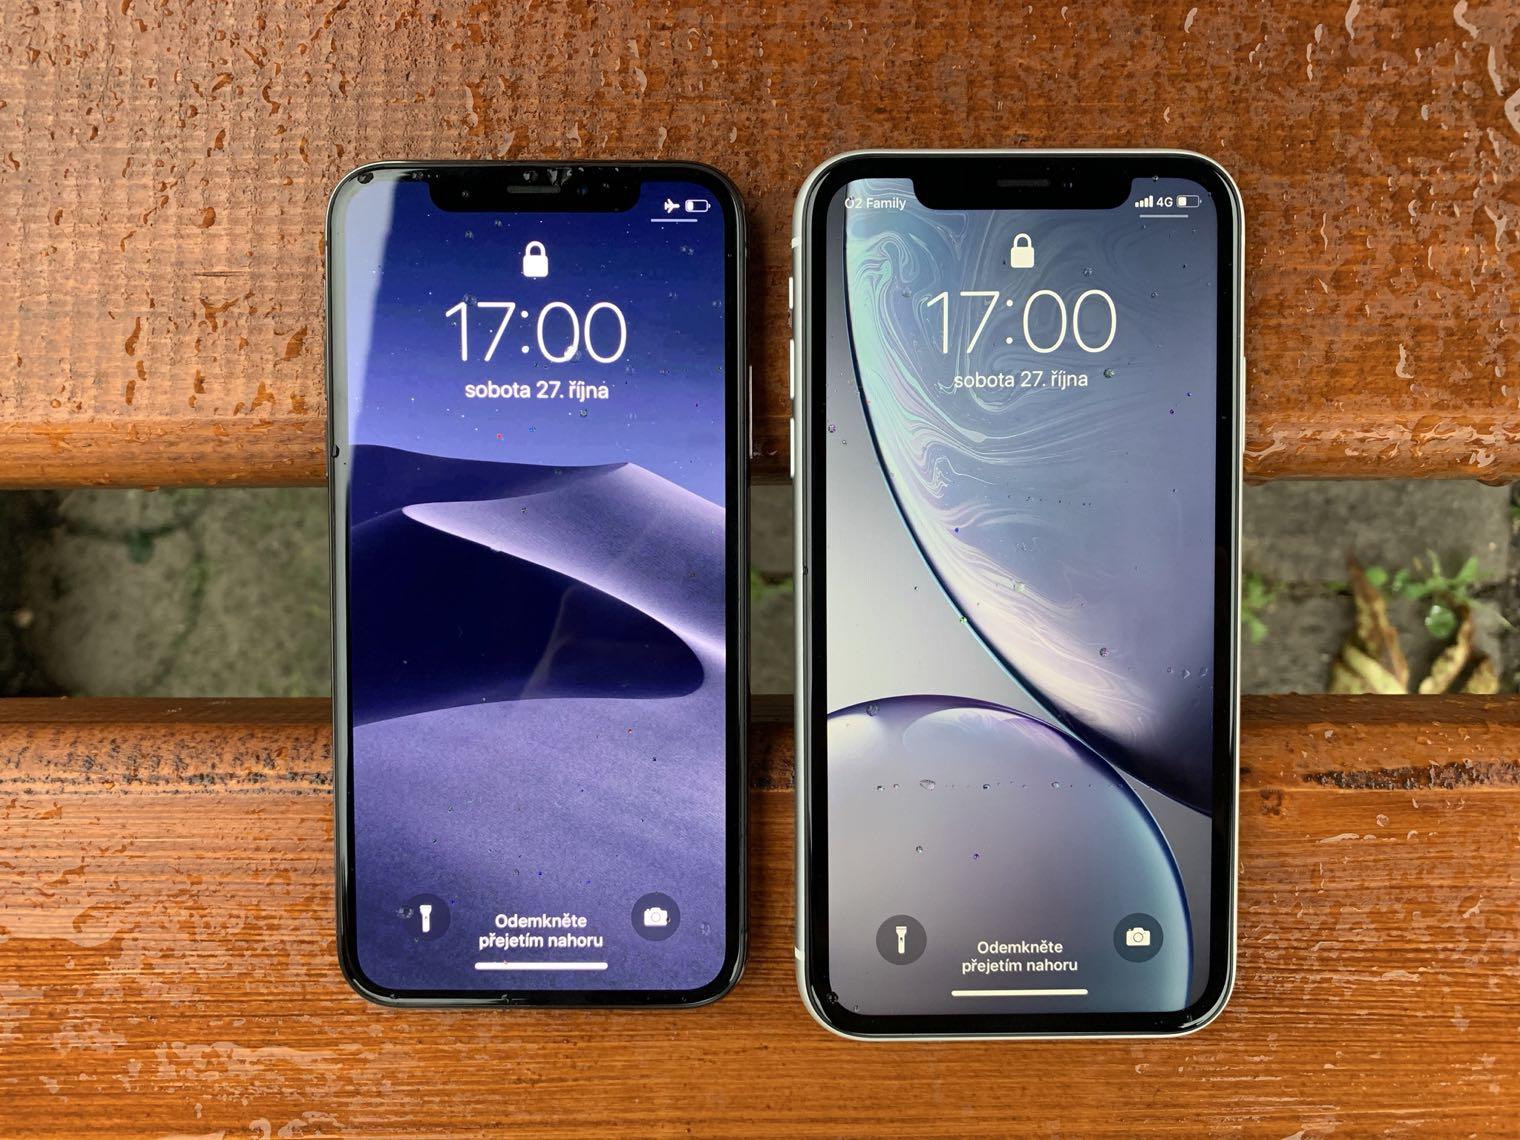 iPhone XR vs iPhone XS 5